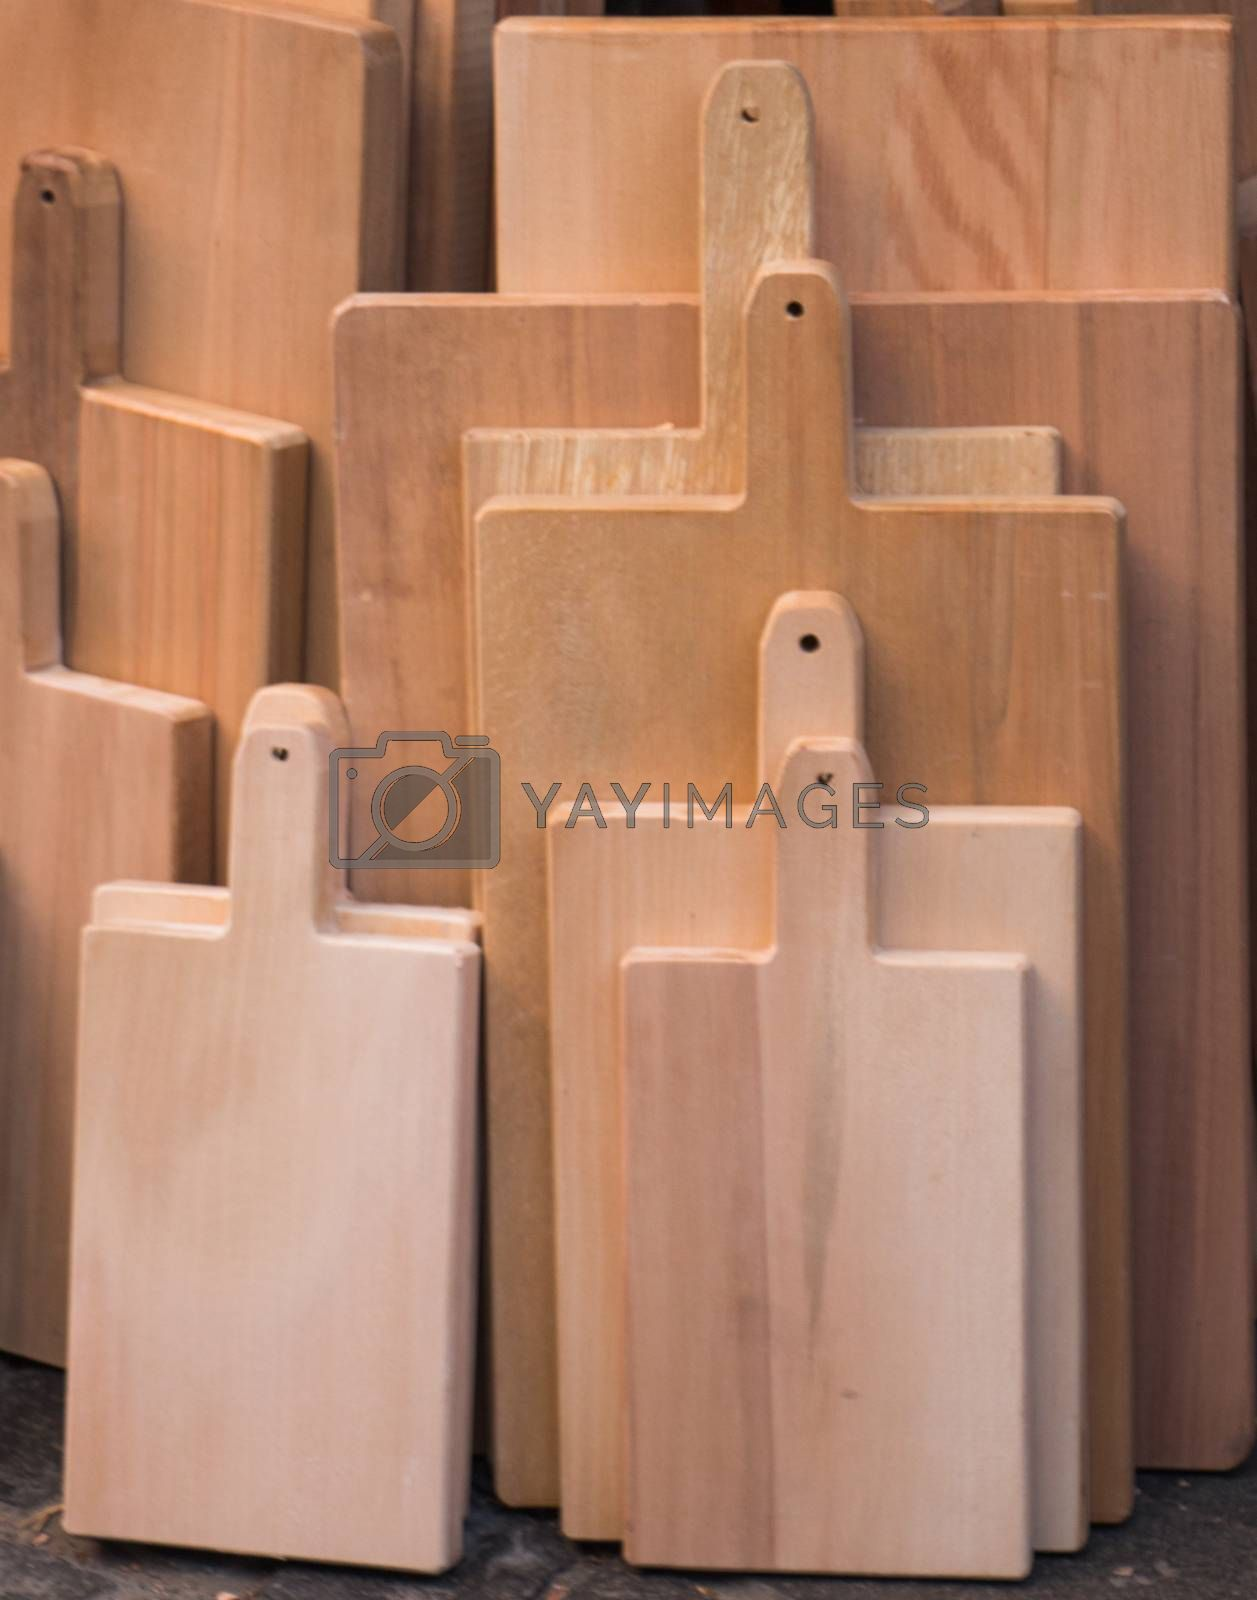 Wooden chopping board as an kitchen item